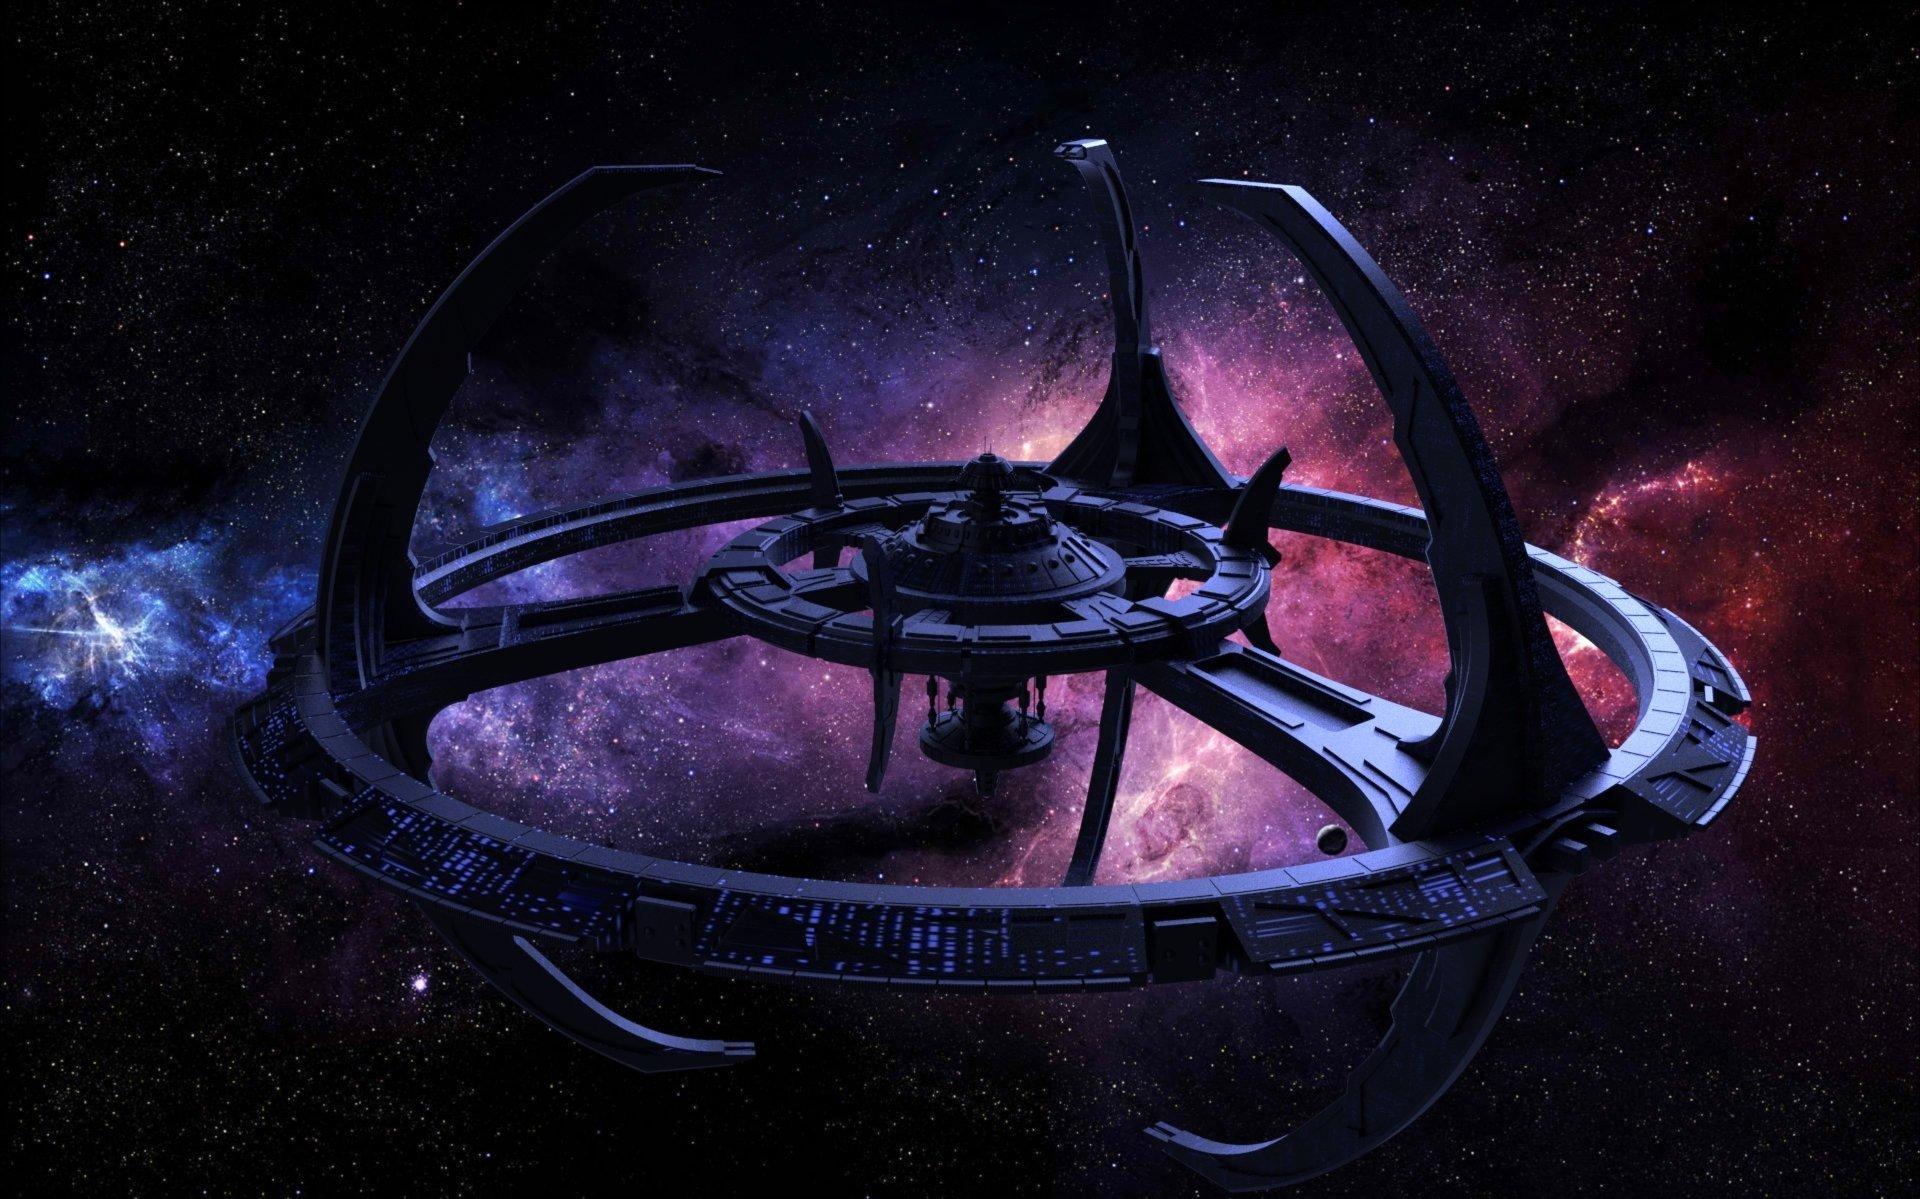 Stars space planet galaxy star trek star trek deep - Deep space wallpaper hd ...